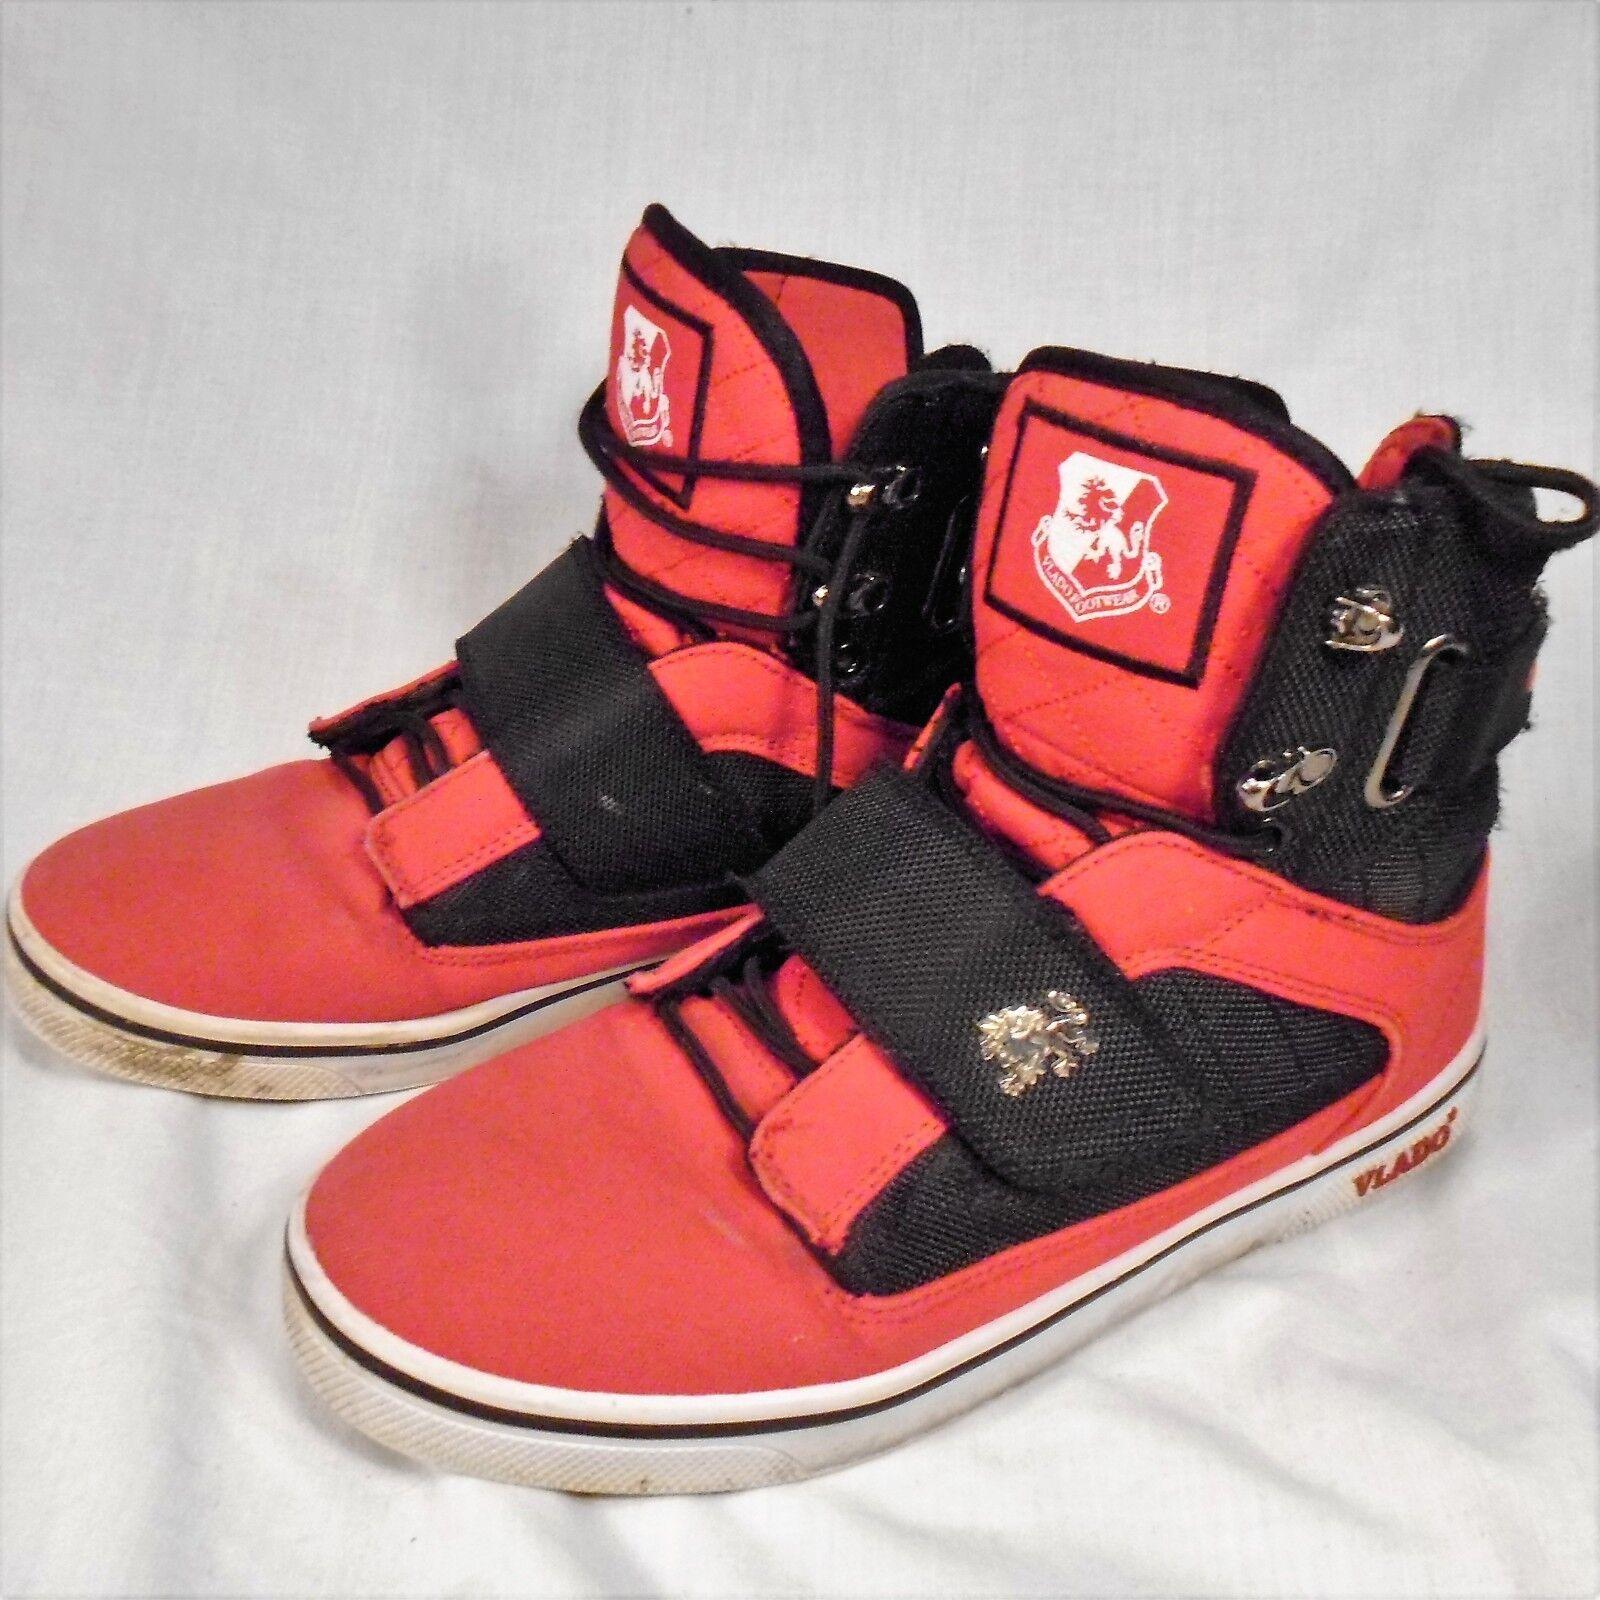 Vlado Footwear Atlas II High Tops Size 8 shoes Red & Black IG-1500-J520